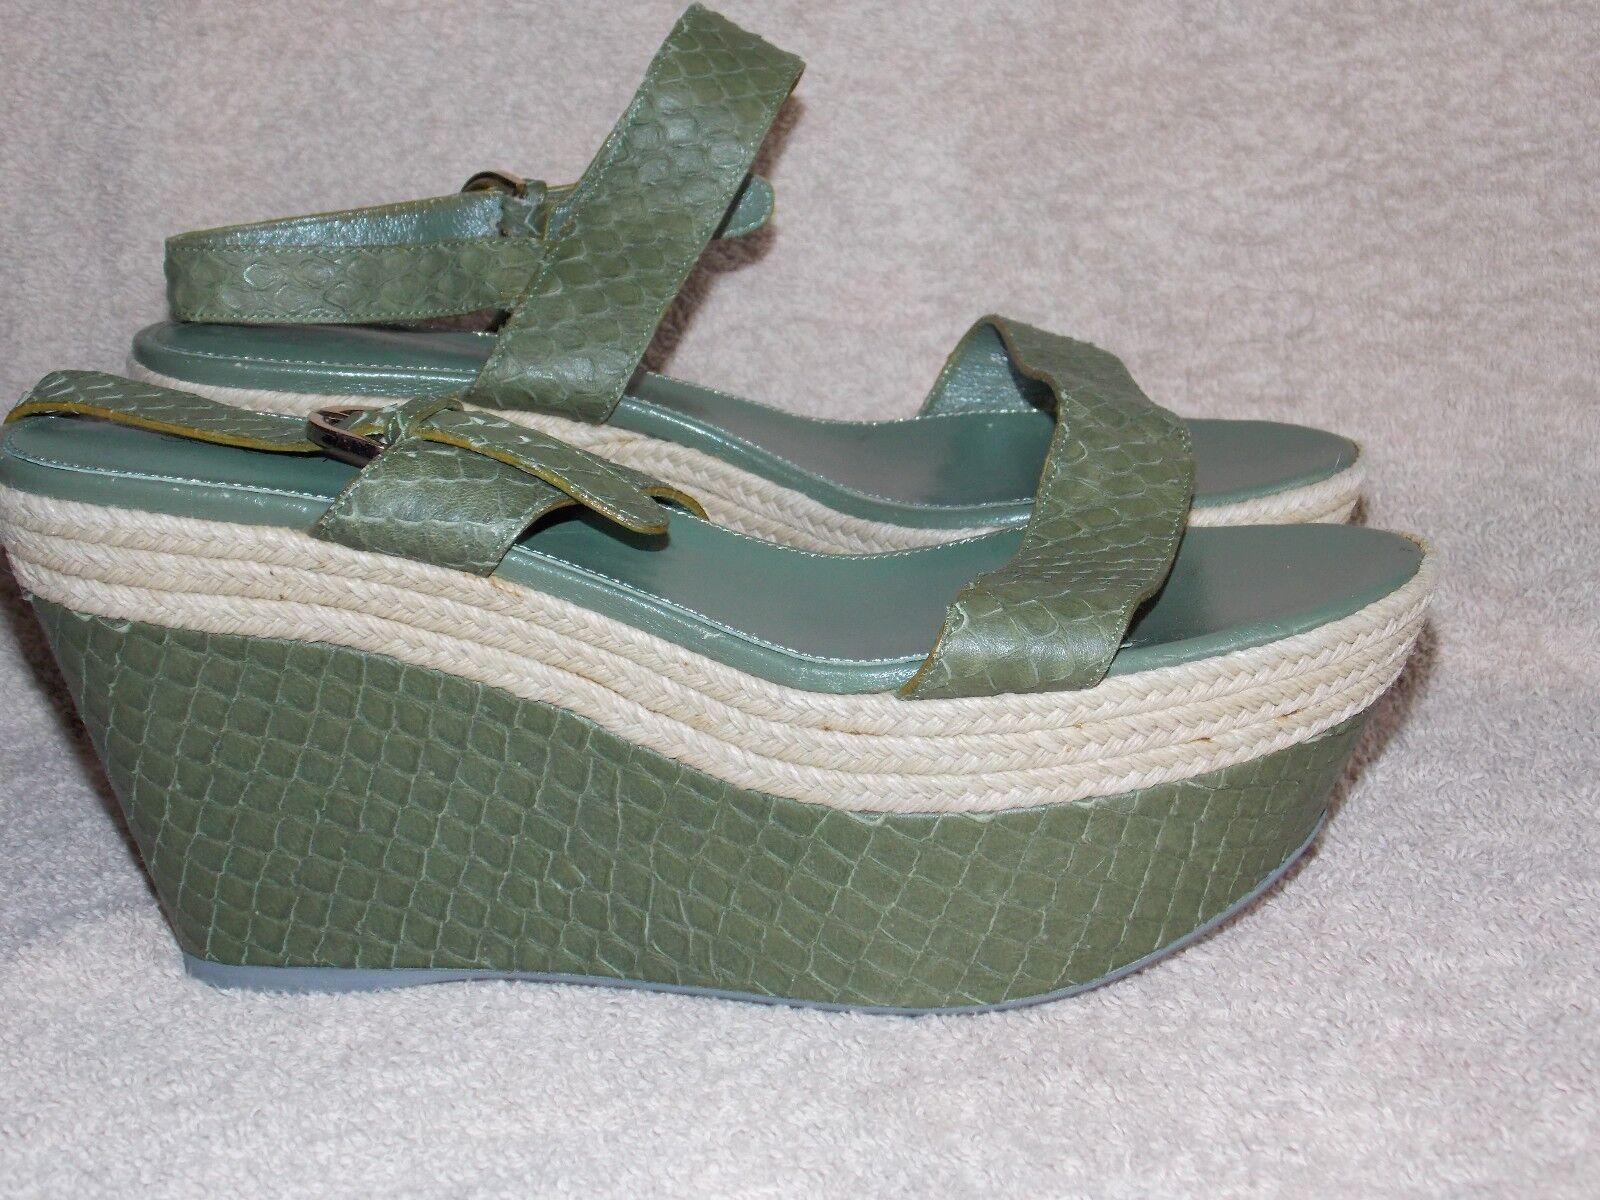 Serio Rossi Snake Olive Green PLATFORM Sandals 39/8.5 Womens New Read Details